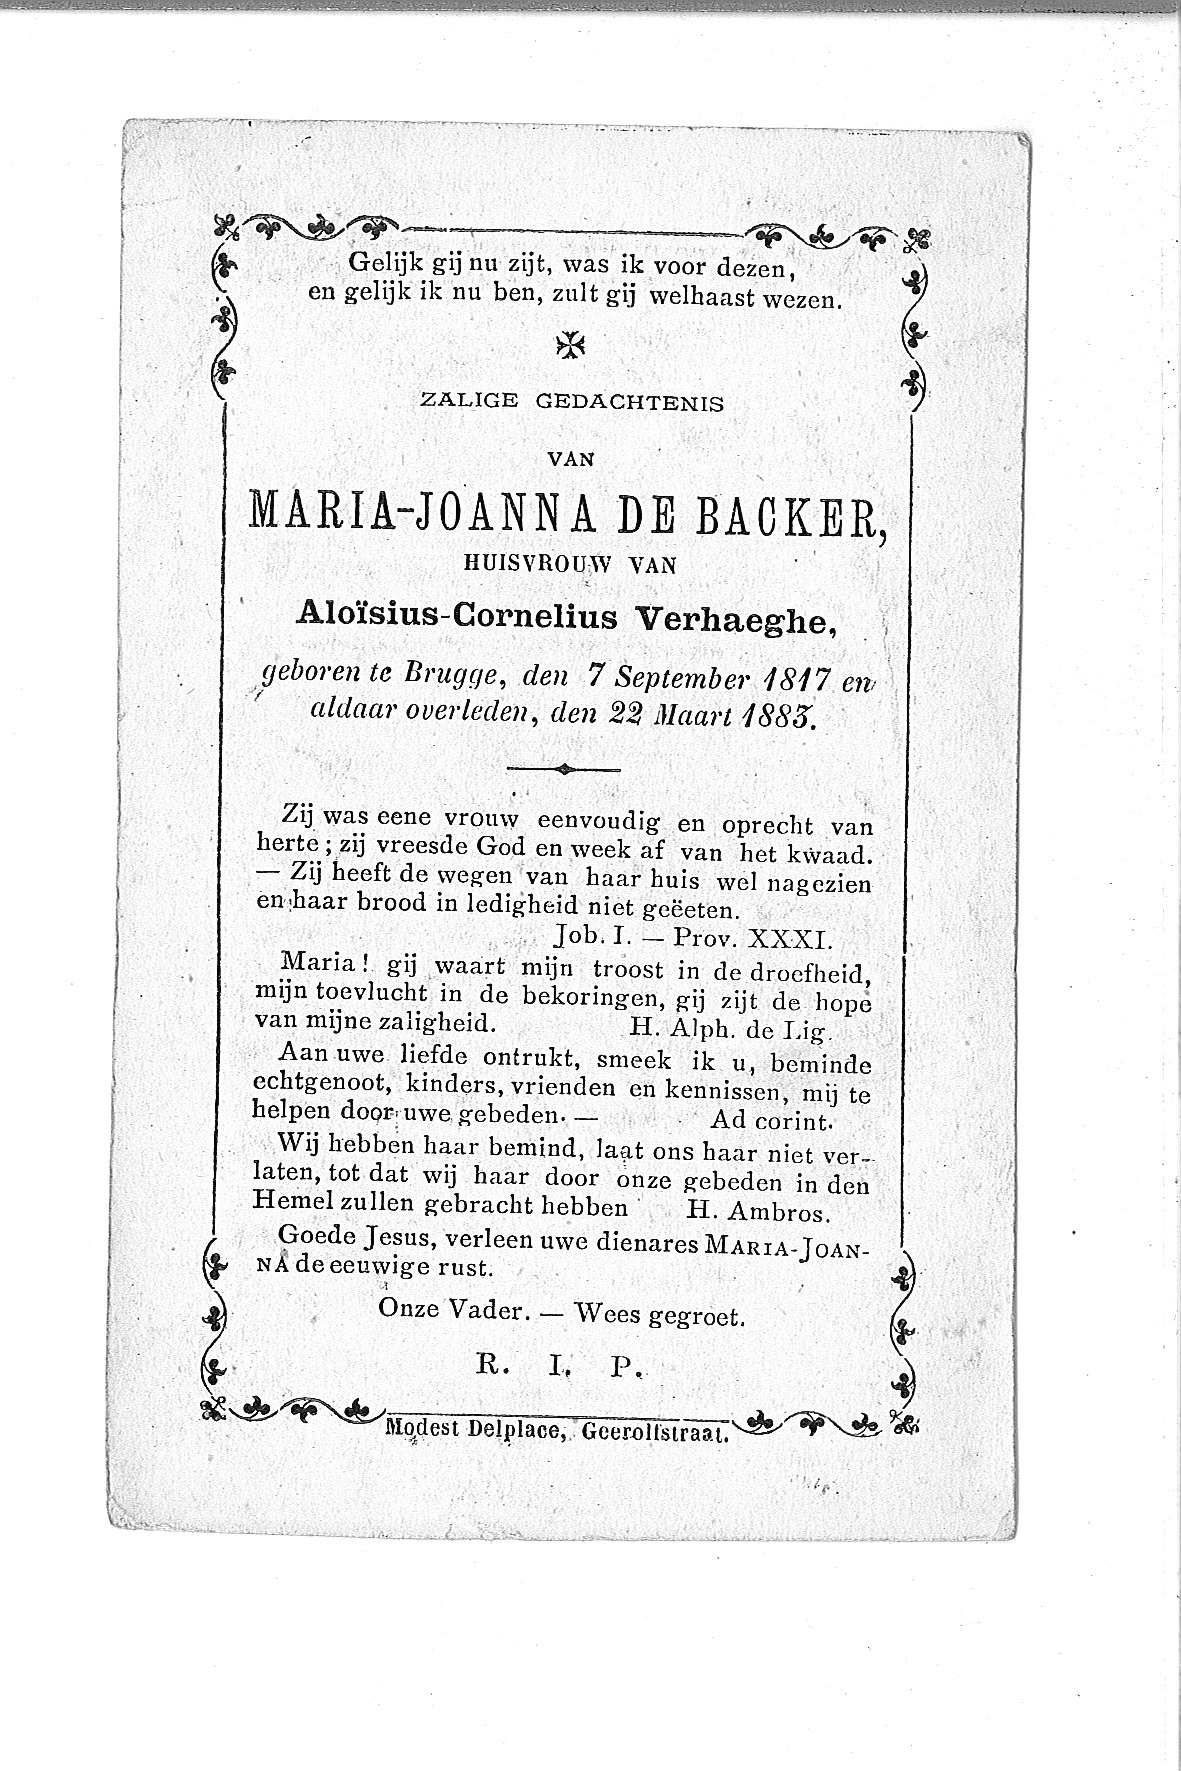 Maria-Joanna (1883) 20120525113050_00100.jpg